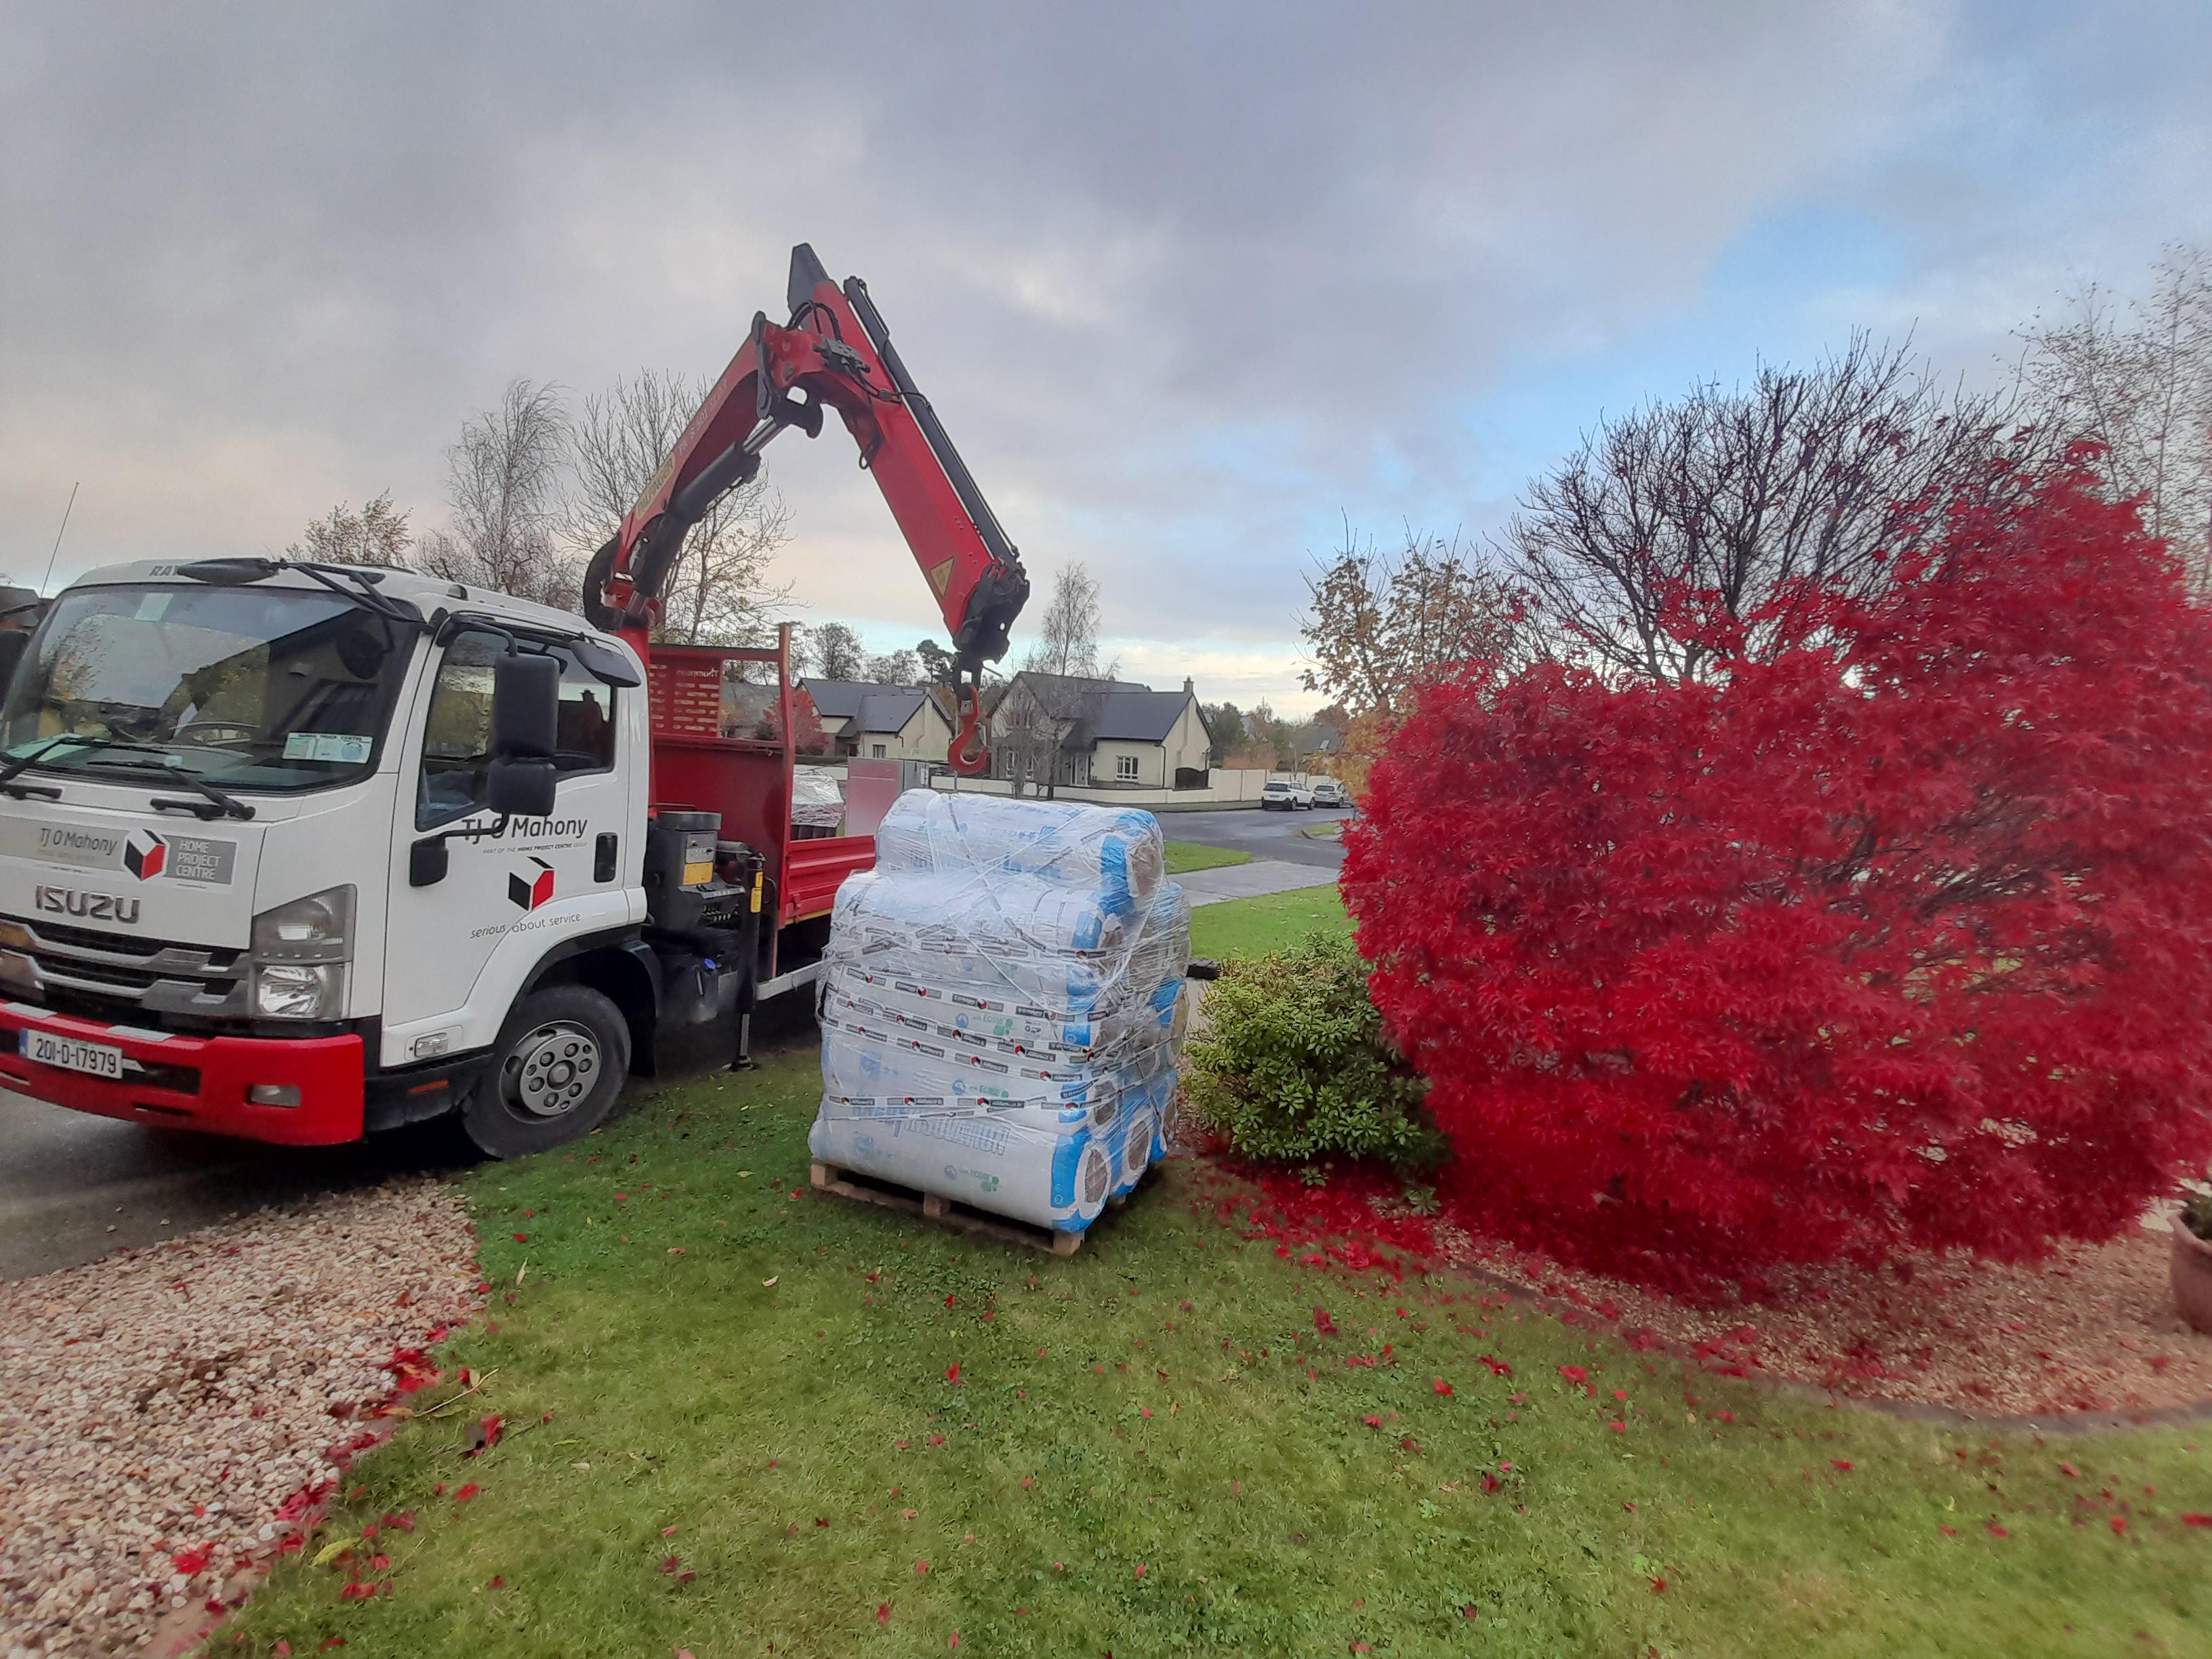 Lorry; Unloading Method